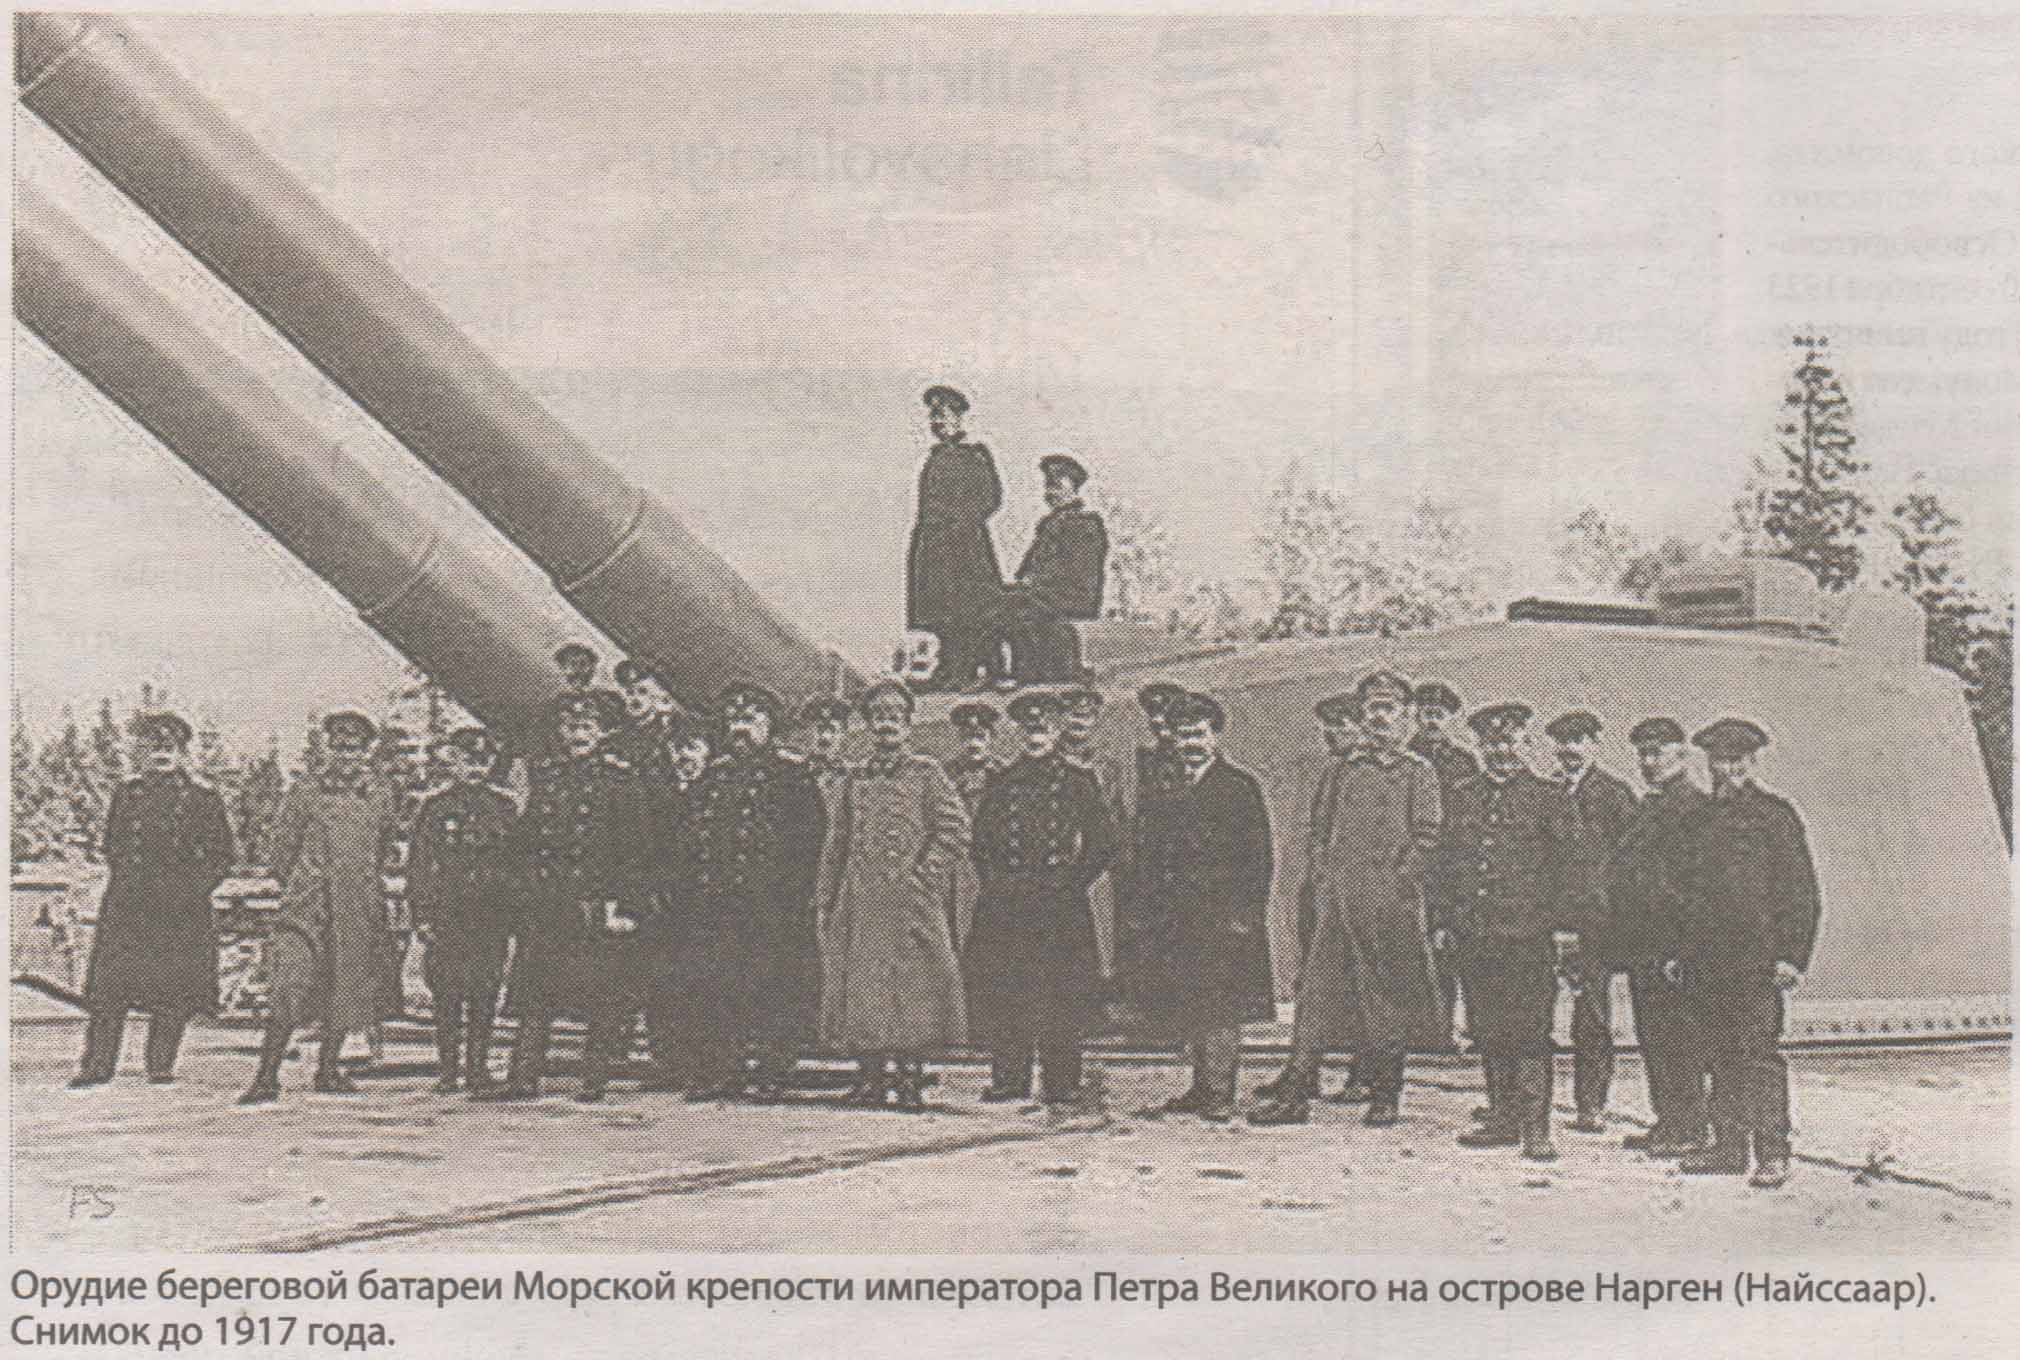 Орудие береговой батареи Морской крепости императора Петра Великого на острове Нарген (Найссаар). Снимок до 1917 года.